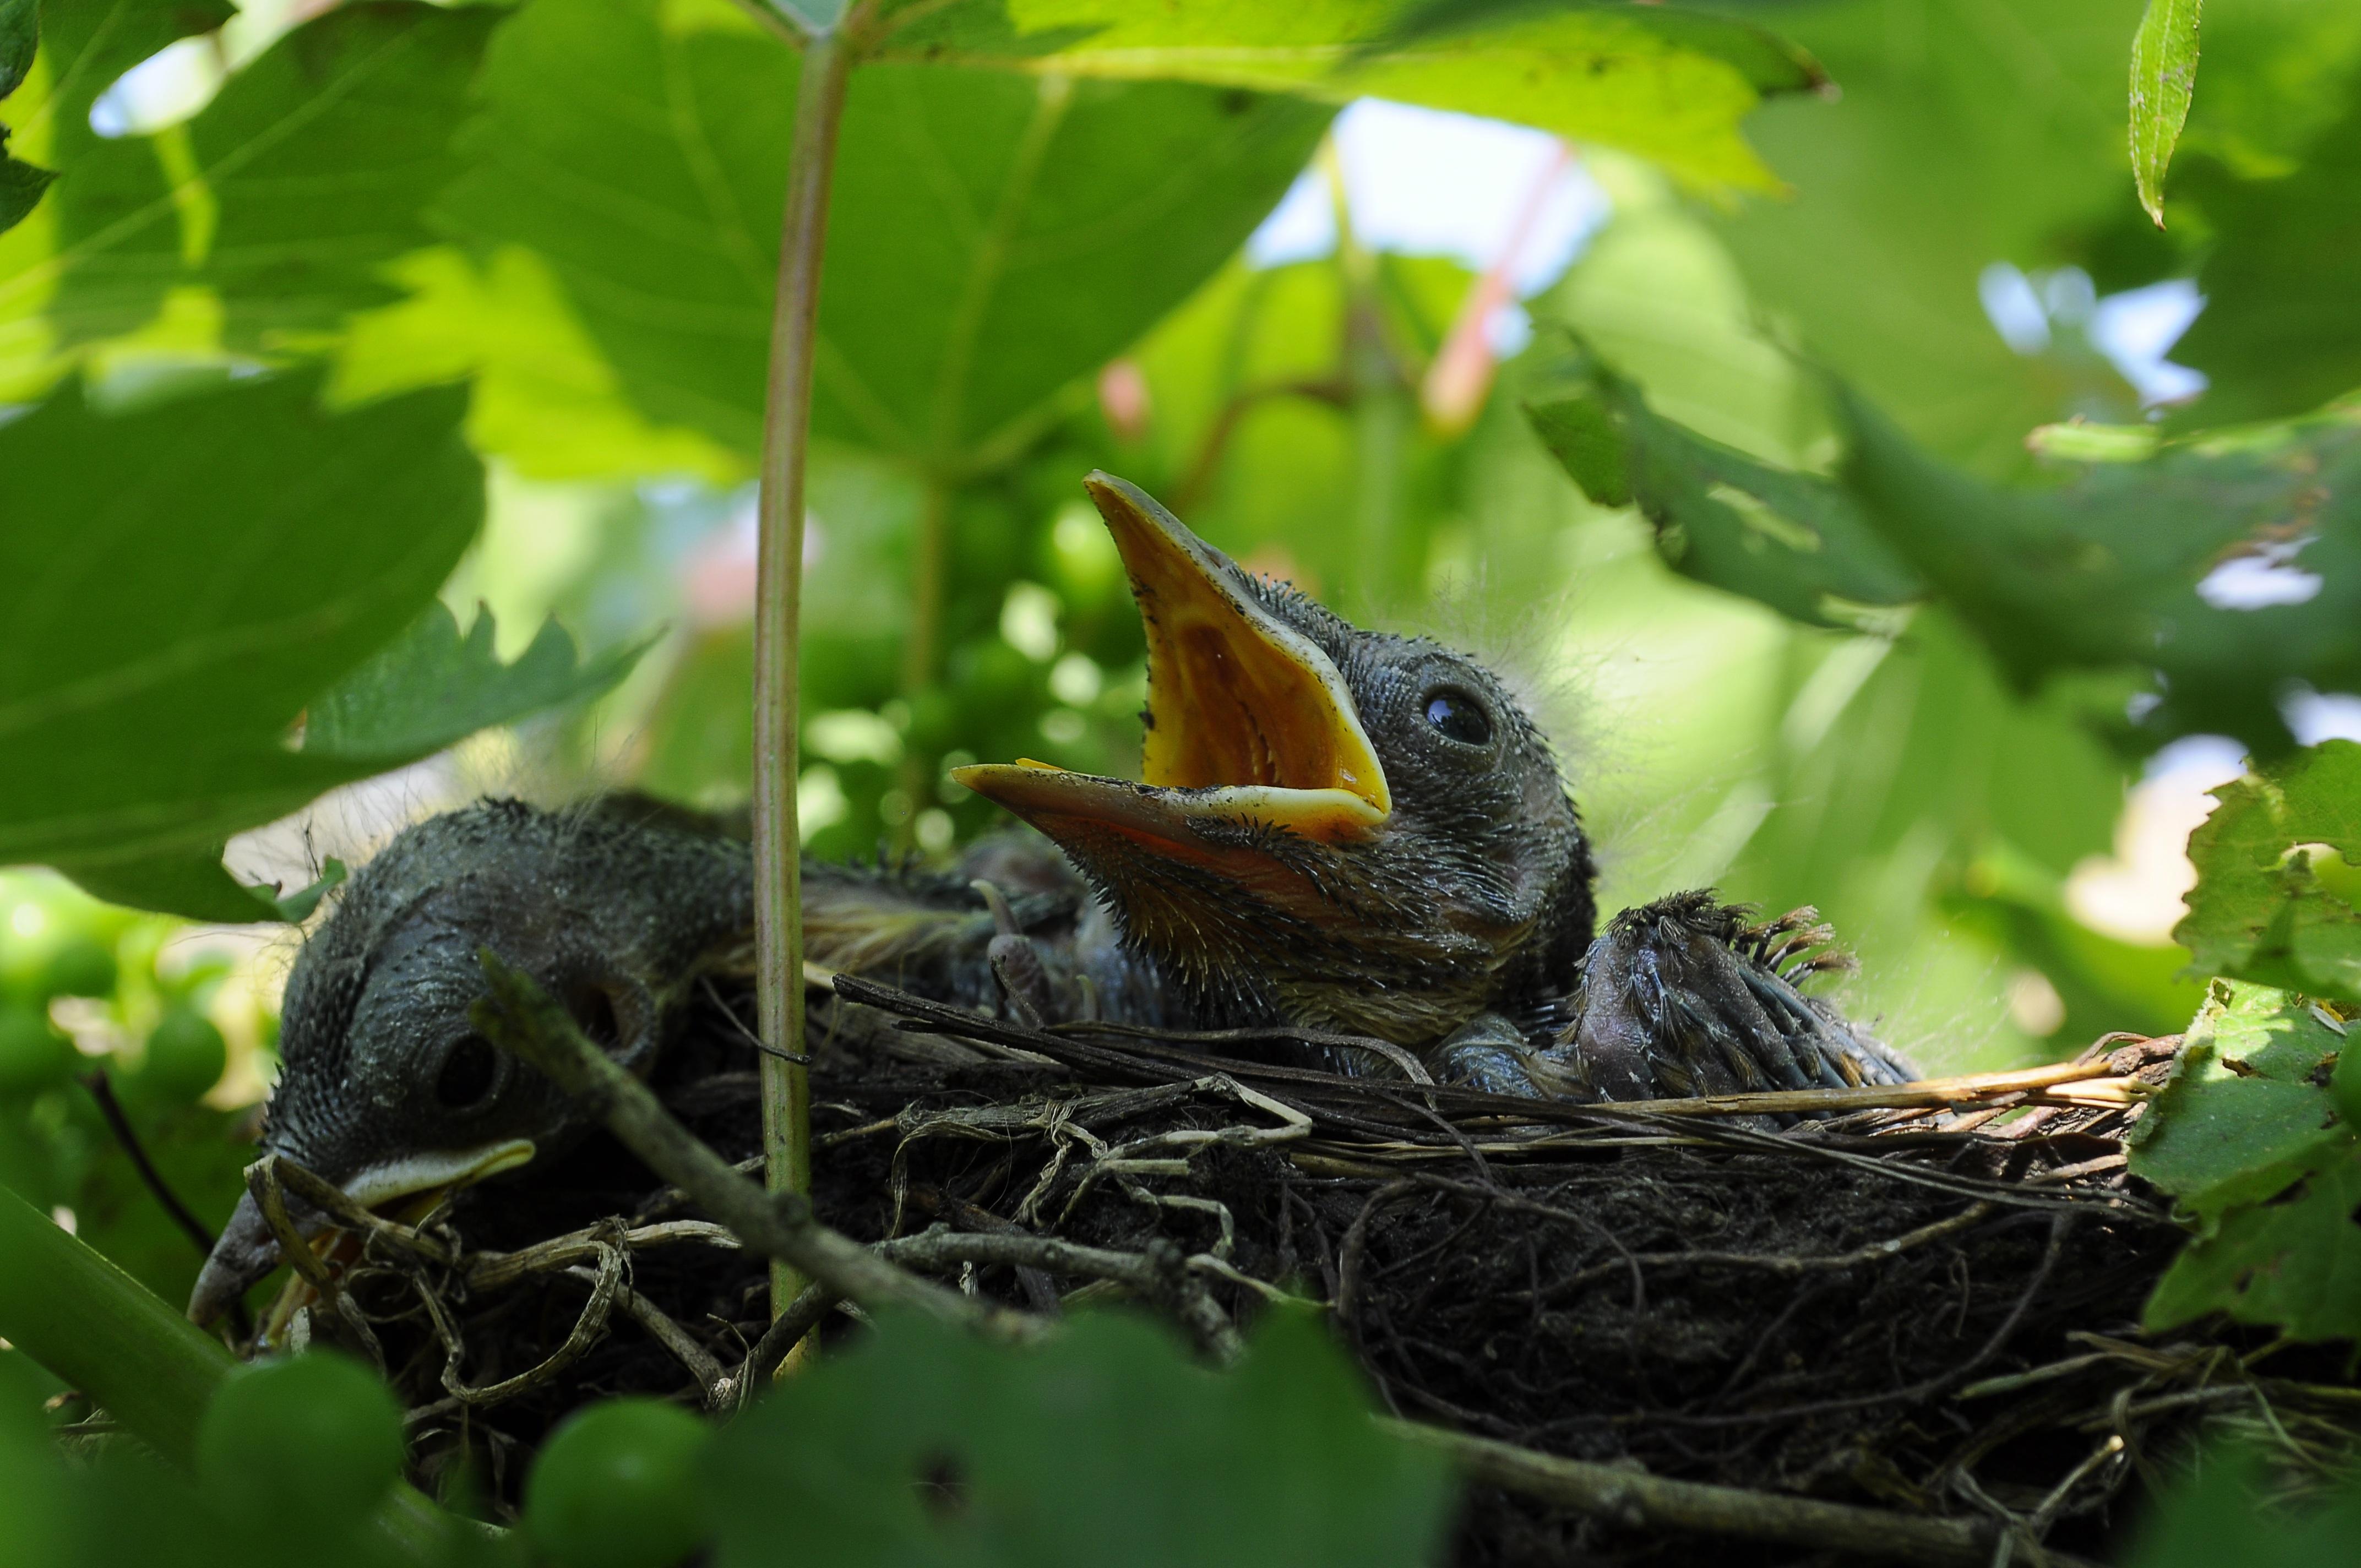 Картинка гнездо с птенцами